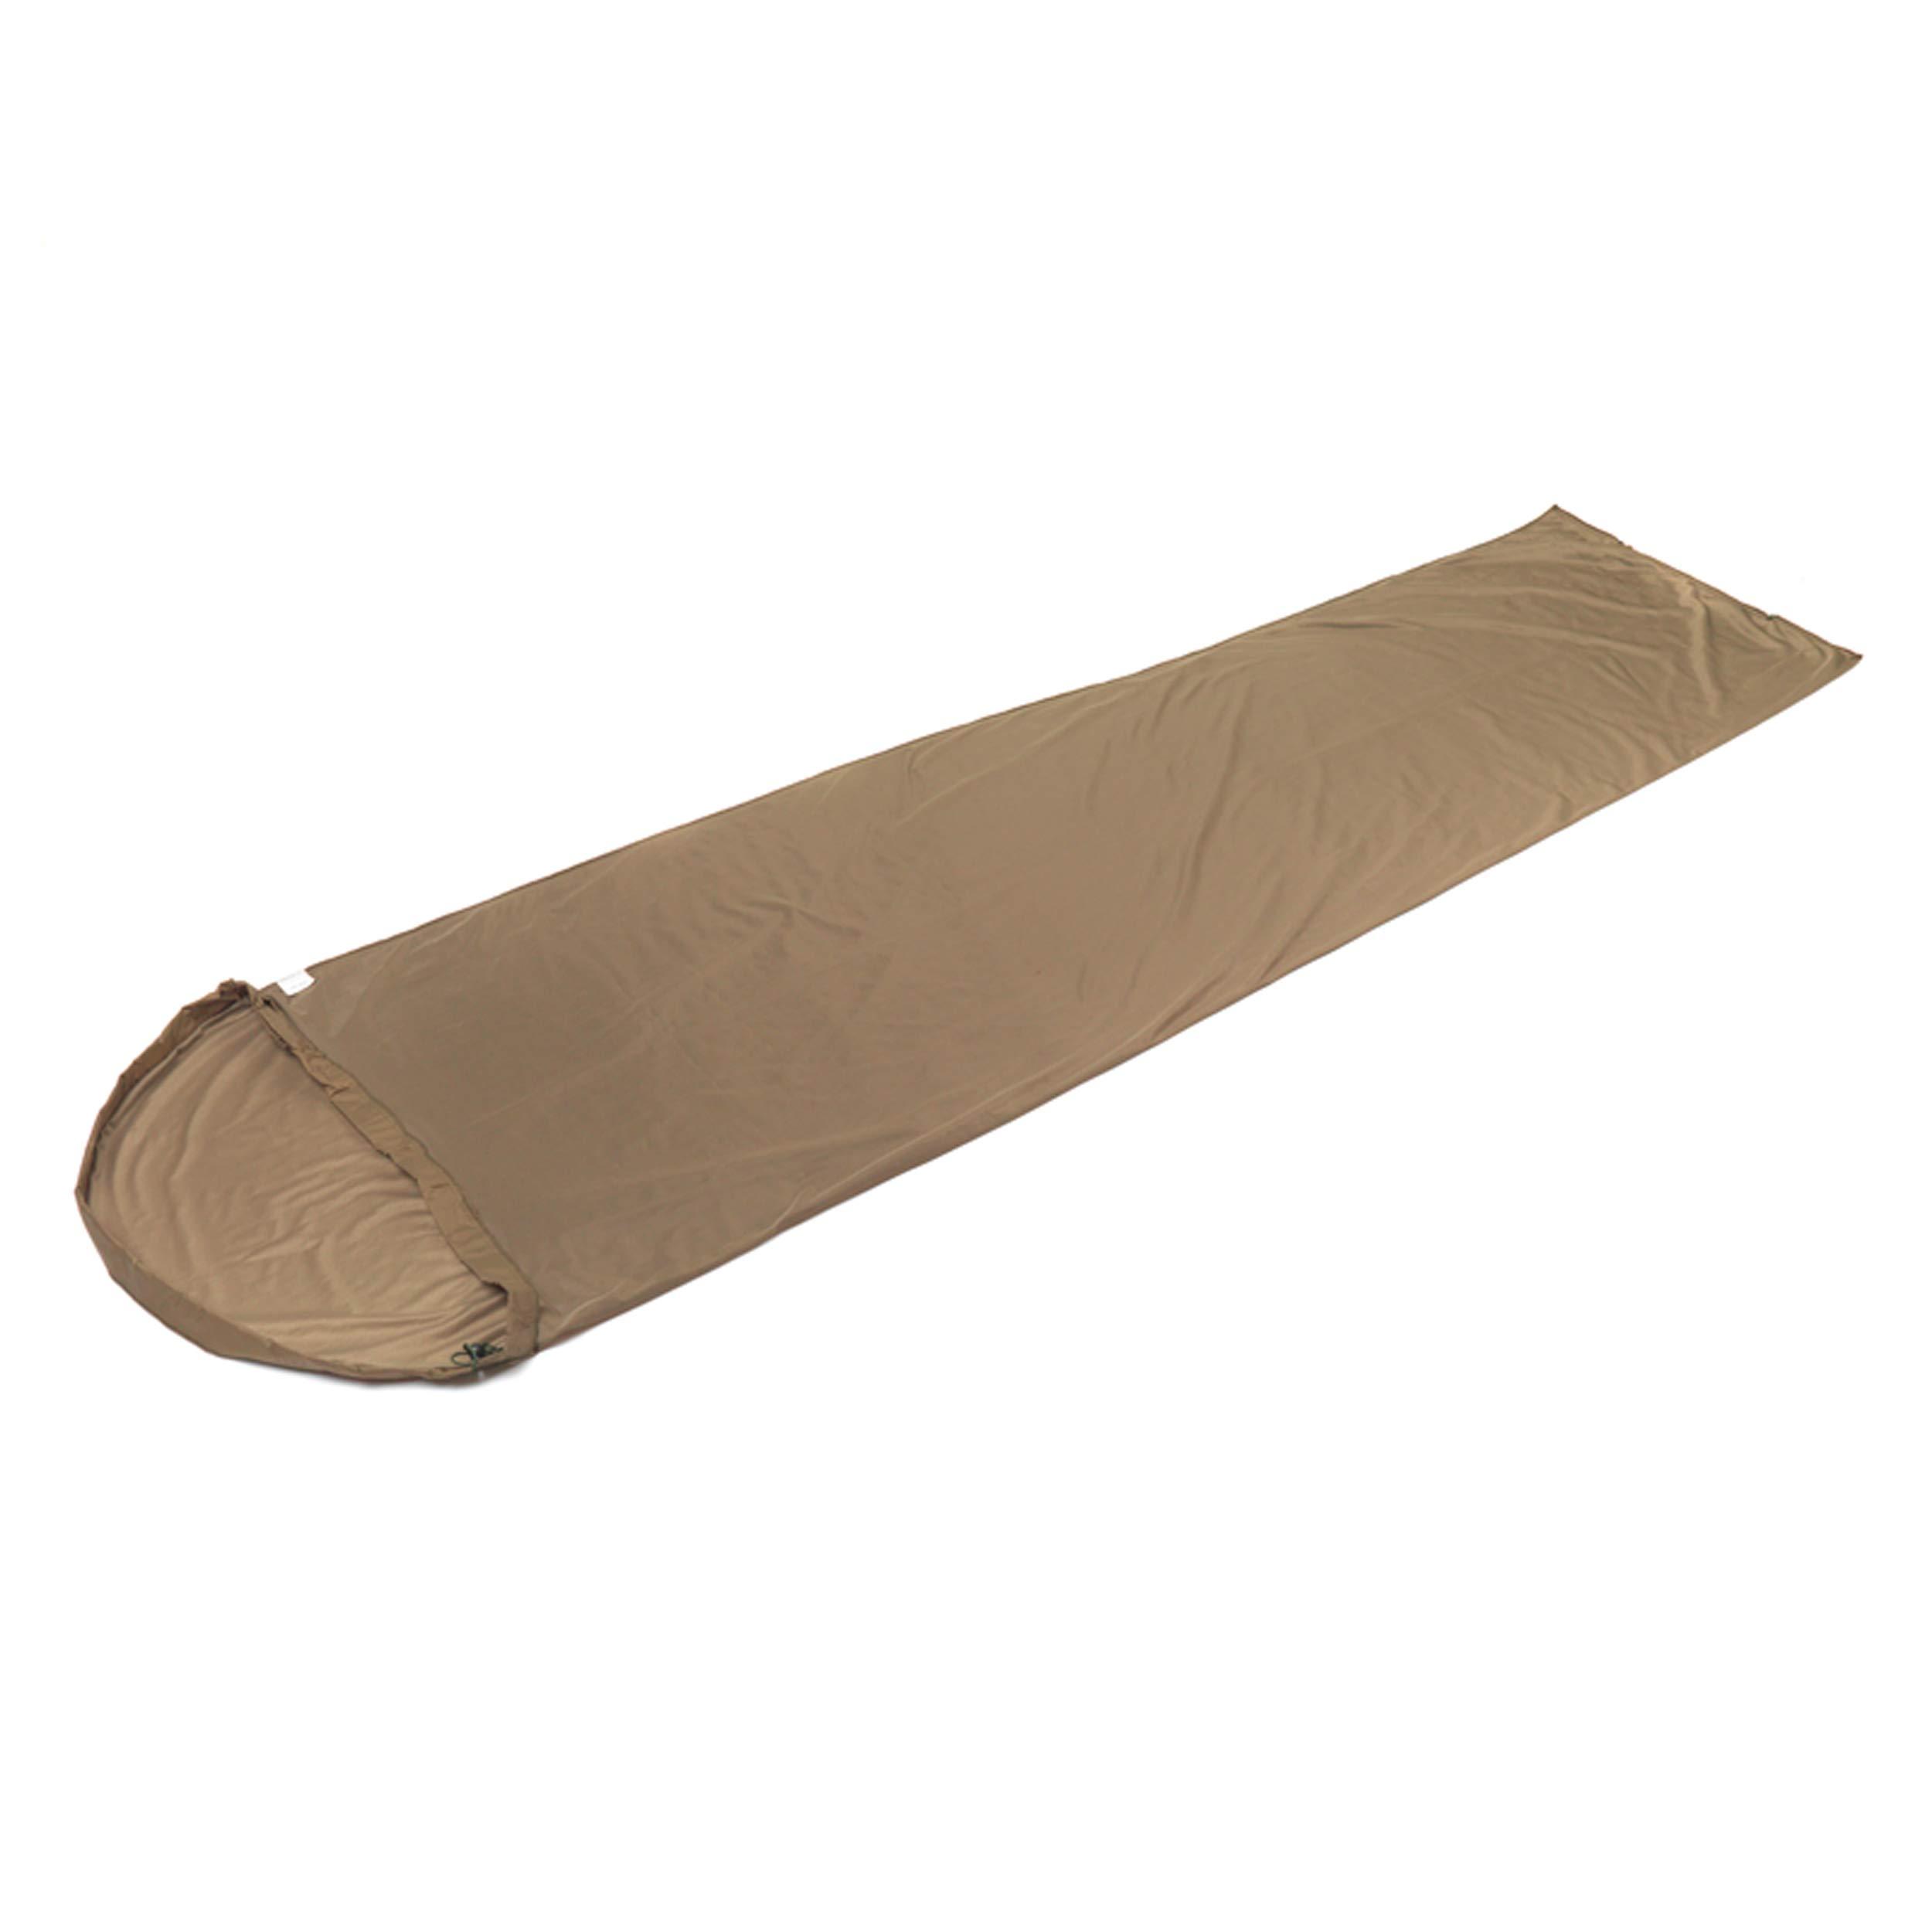 Snugpak TS1 Thermal Suede Sleeping Bag Liner, Polyester, Warm Insulation, Desert Tan by Snugpak